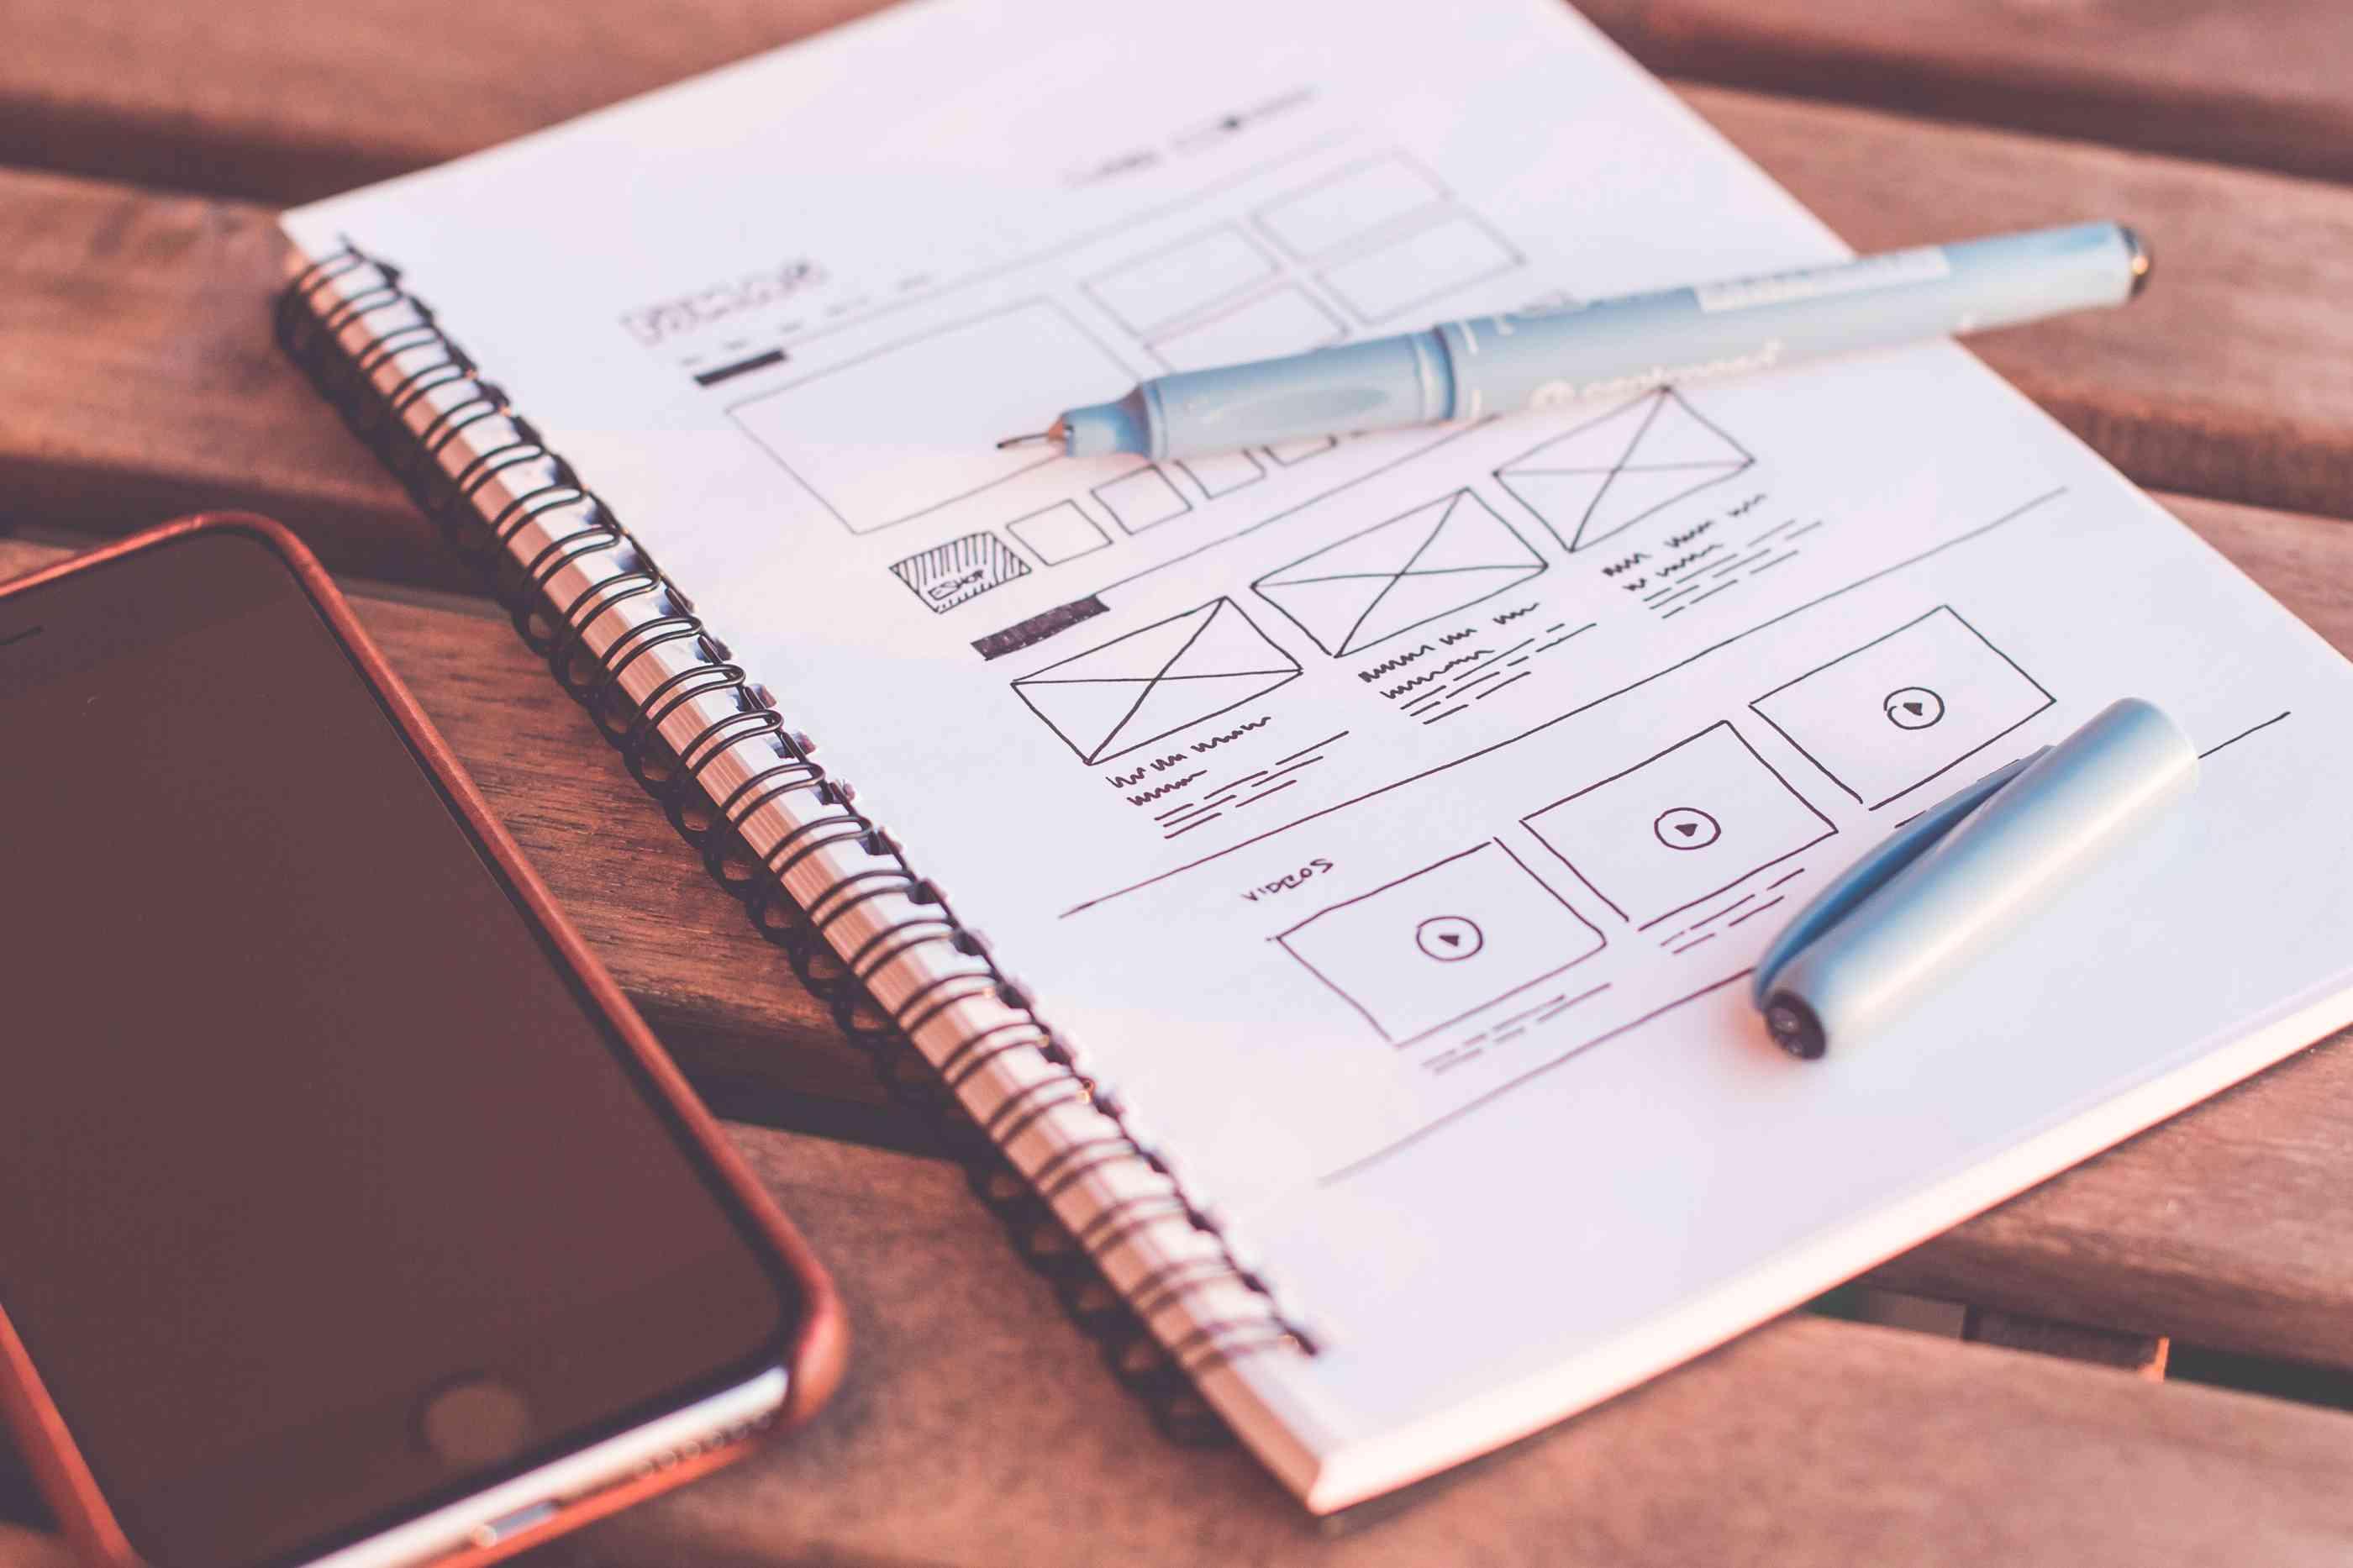 8 Skills Every Web Design Expert Should Have